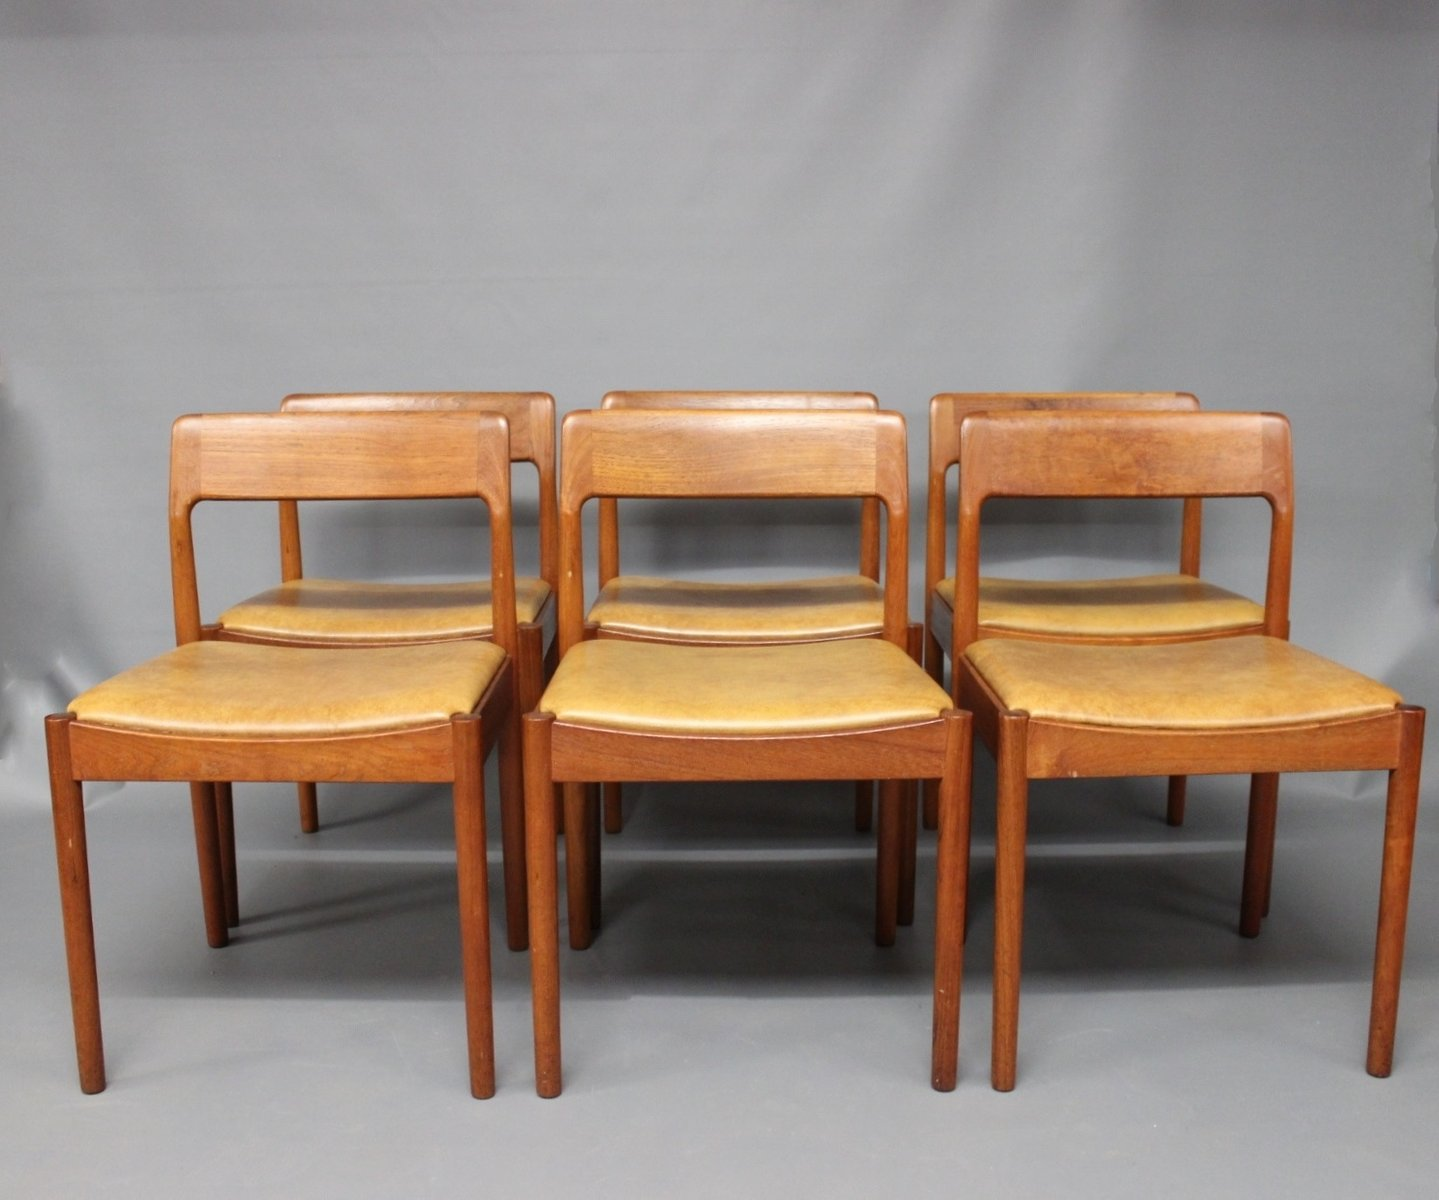 Dining Room Chairs By N.O. Møller For J.L. Møller, 1960s, Set Of 6